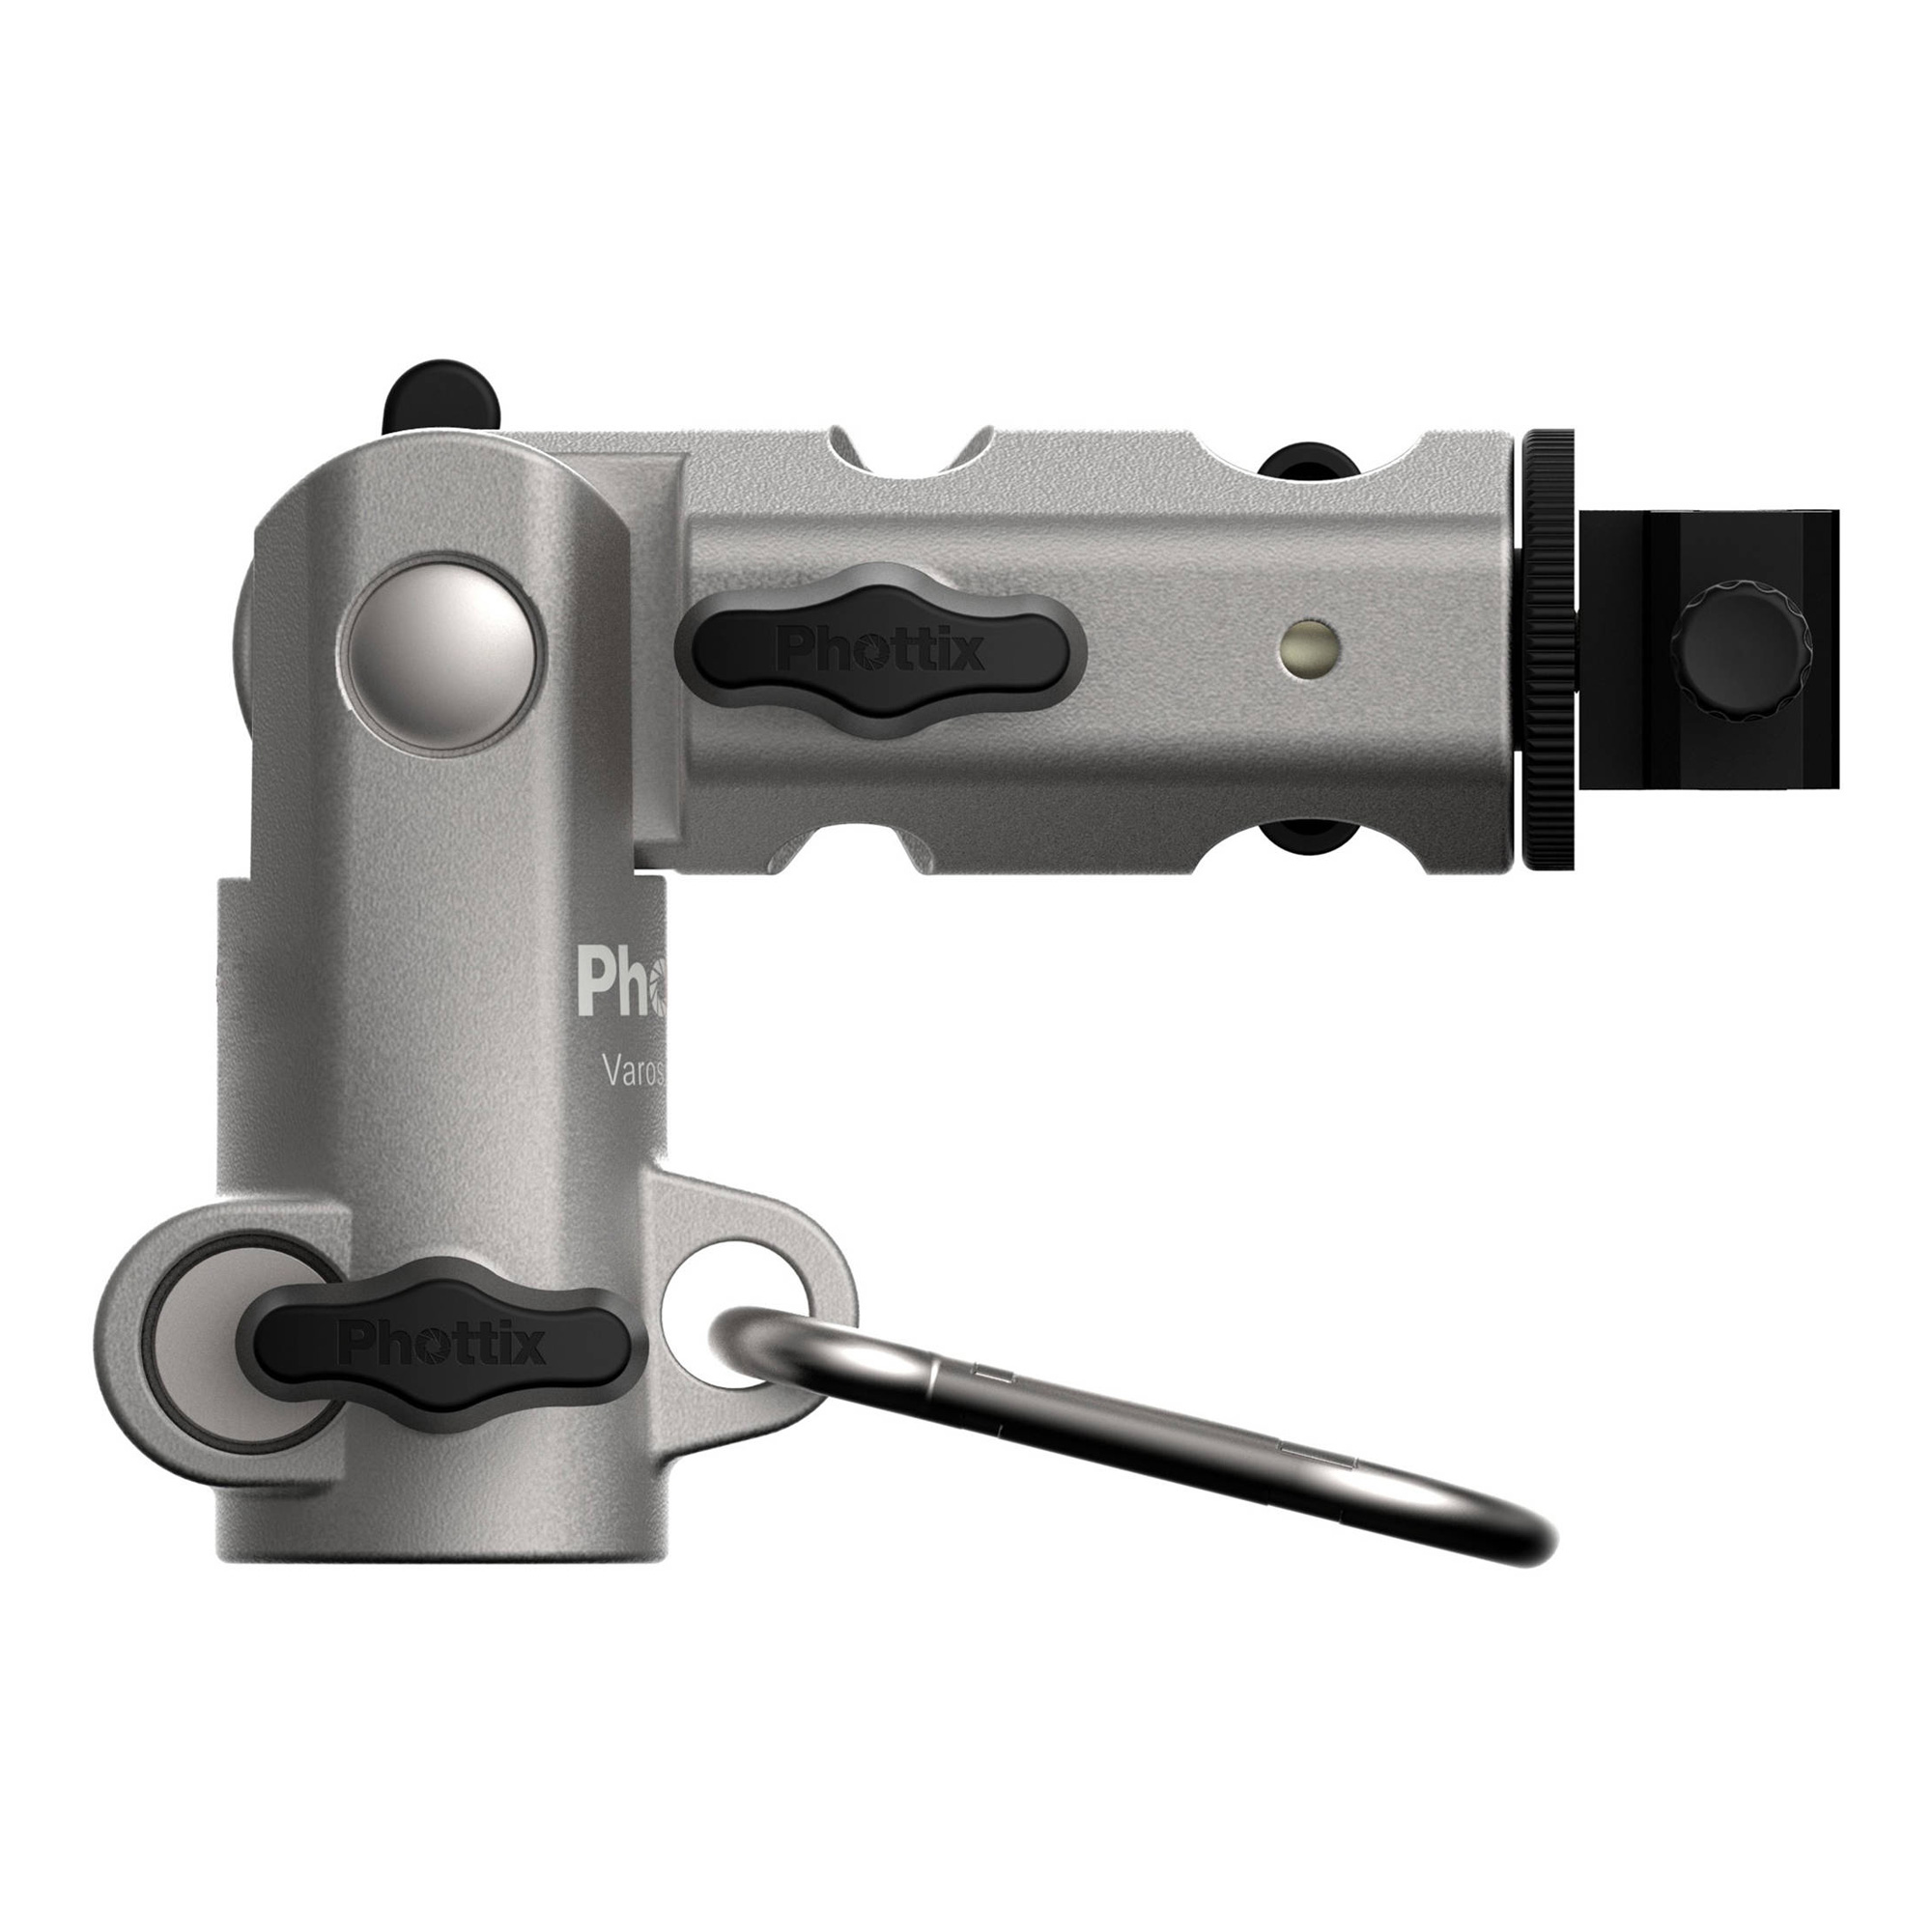 Varos Pro BG Multi-Function Flash Shoe Umbrella Holder